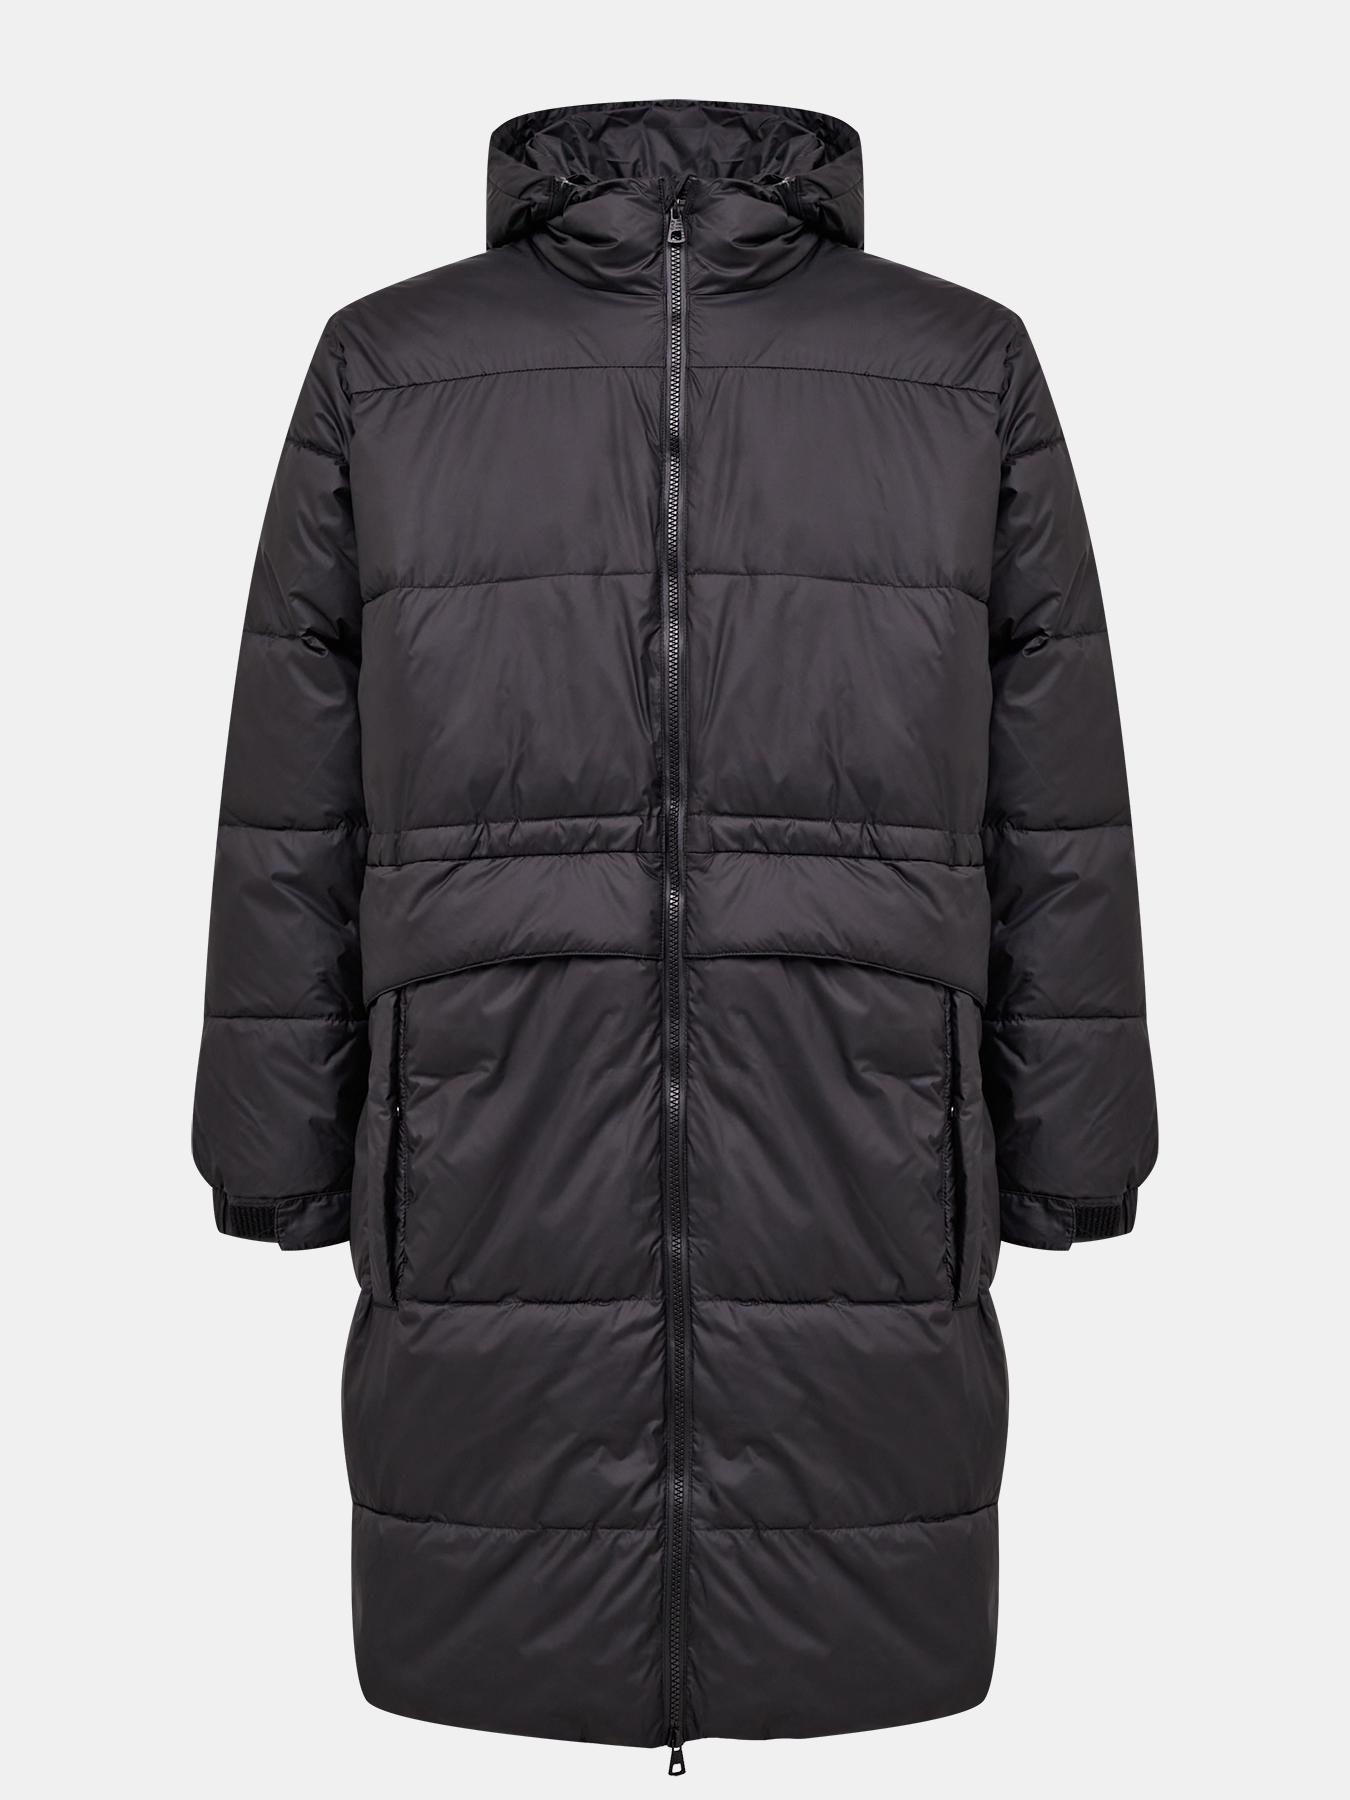 EA7 Emporio Armani Удлиненная куртка